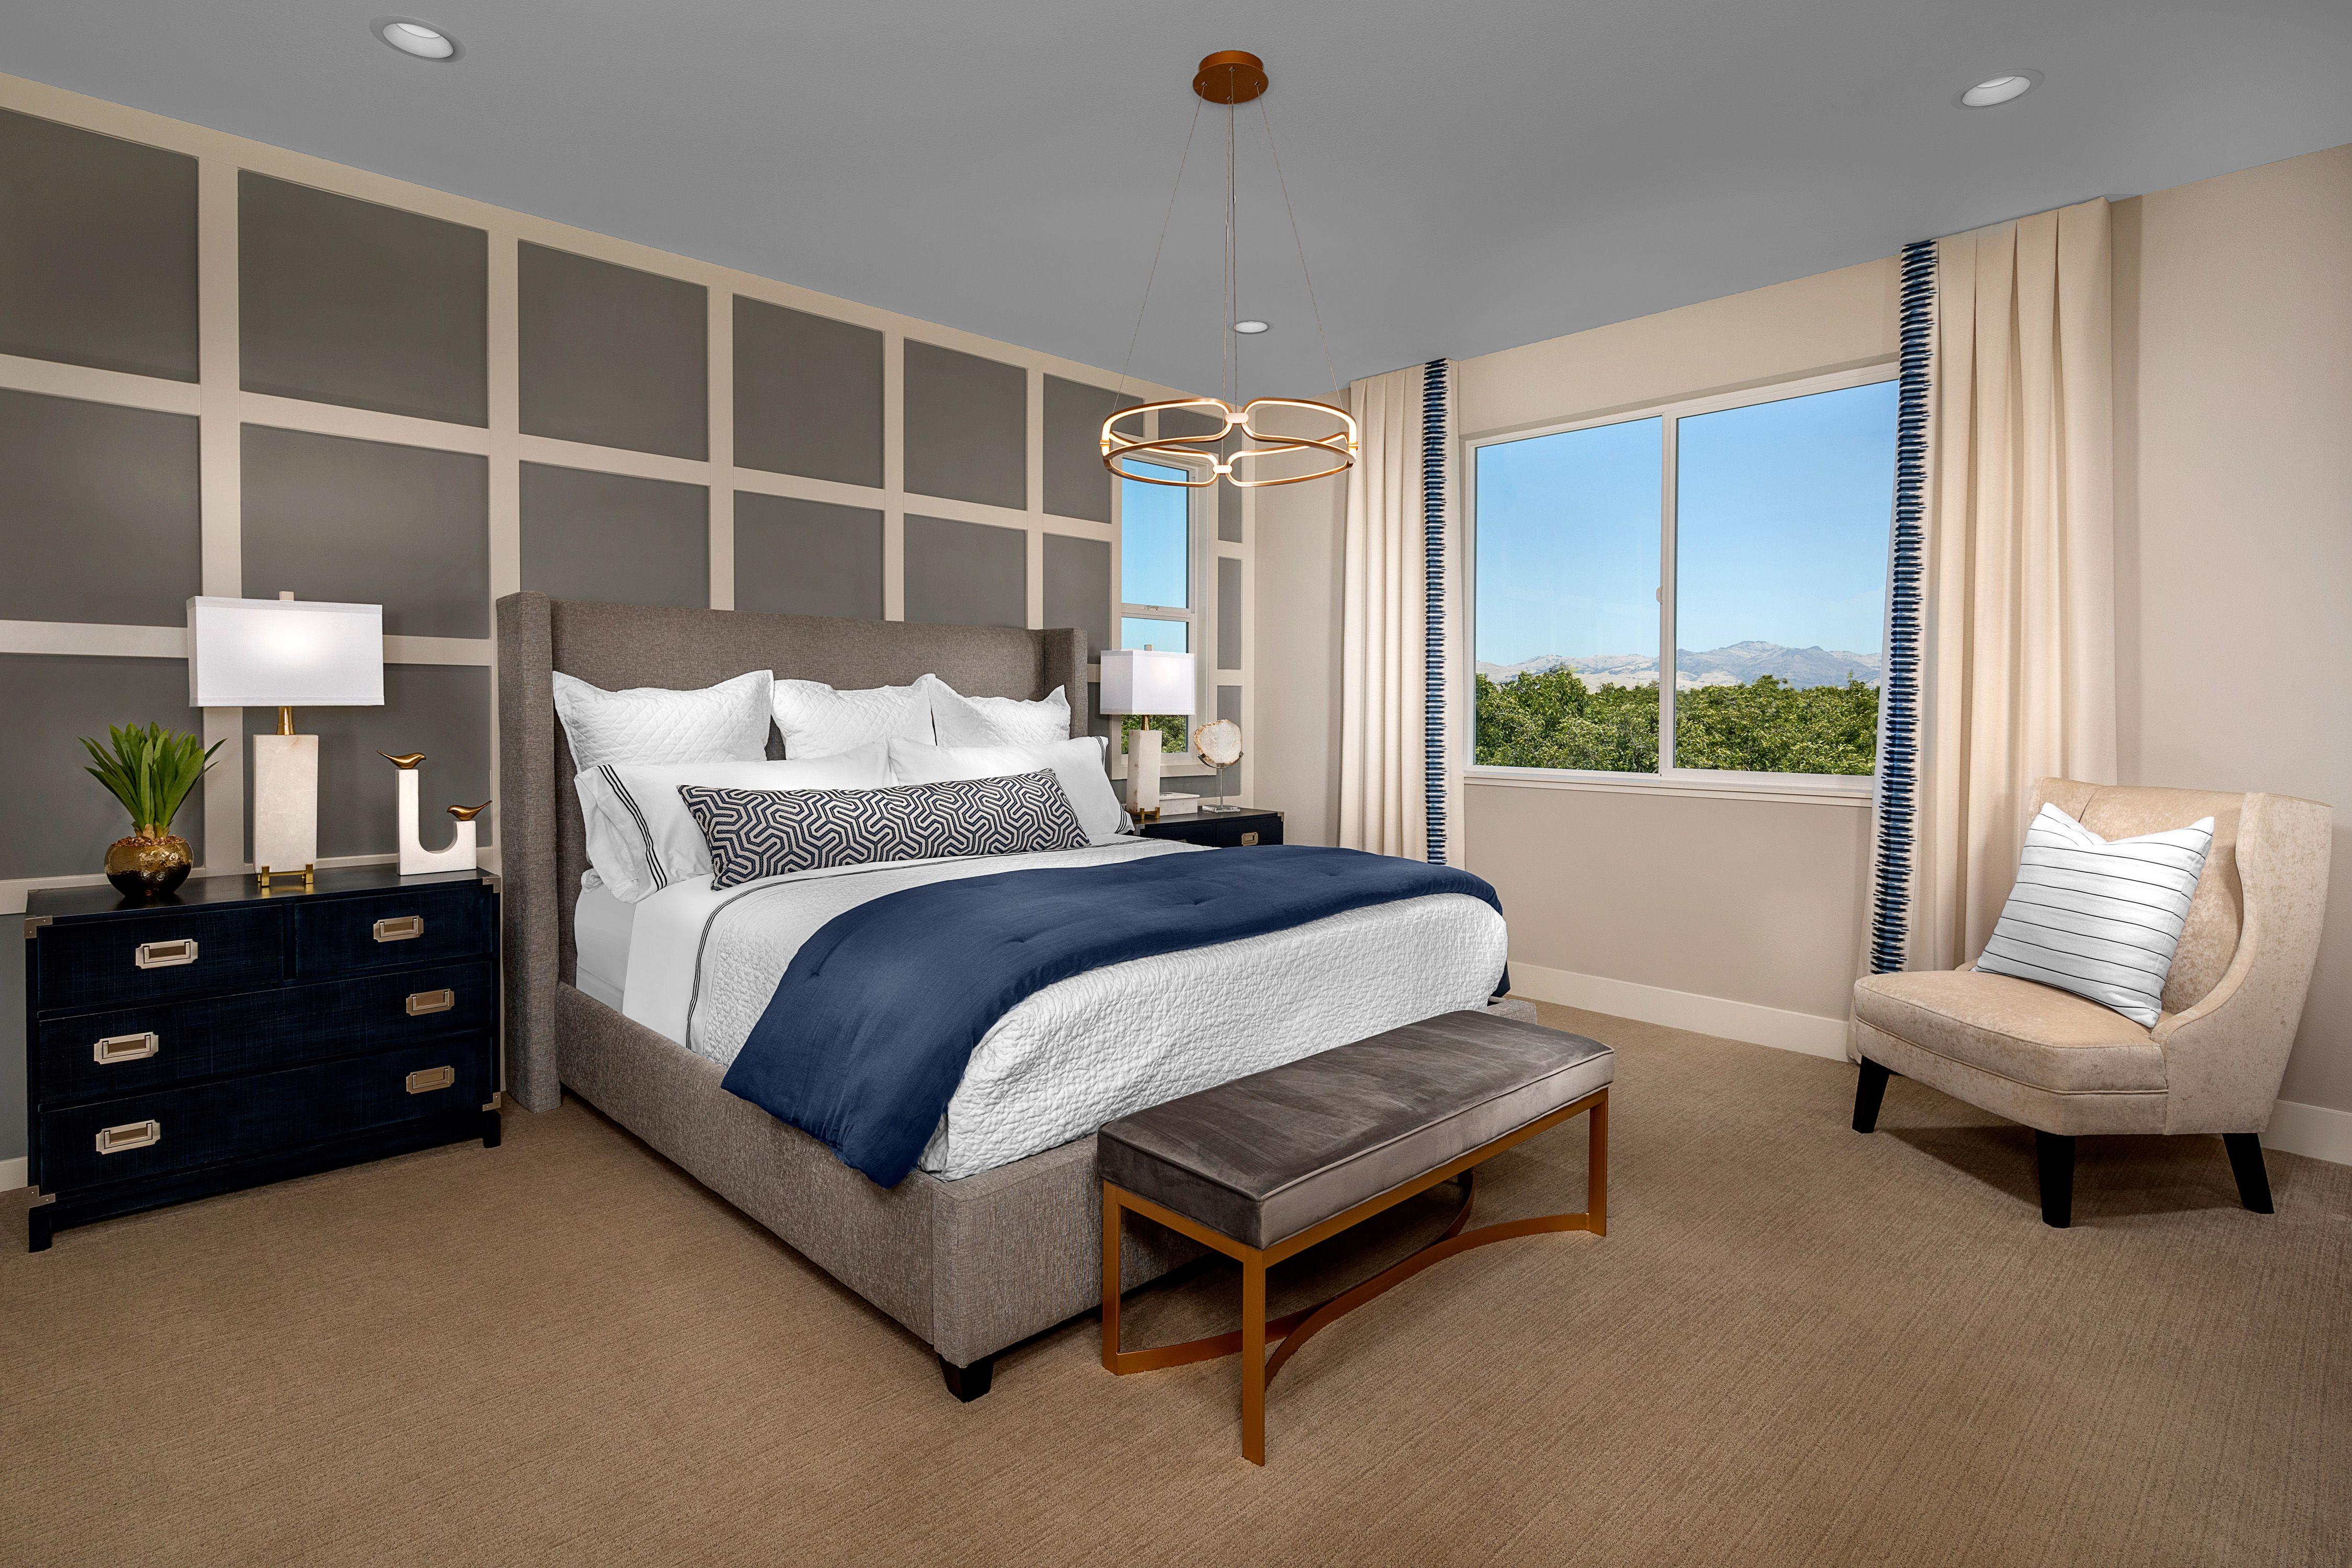 Bedroom featured in the Mayfair Residence 2 By Kiper Homes in Santa Cruz, CA